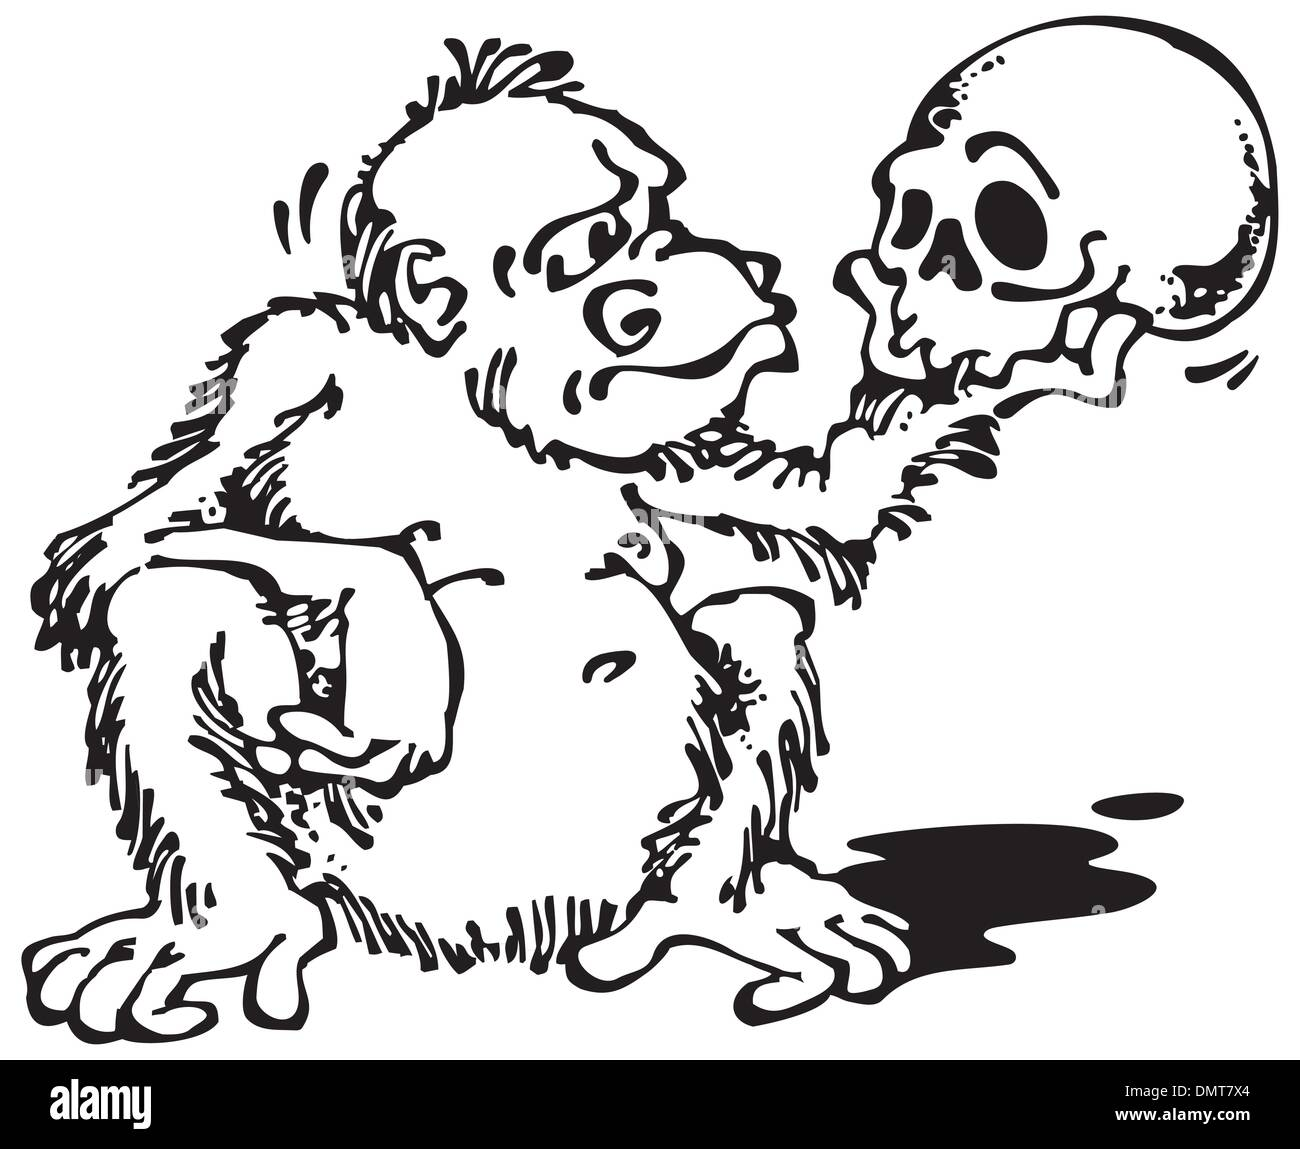 Monkey and Skull_Black - Stock Vector